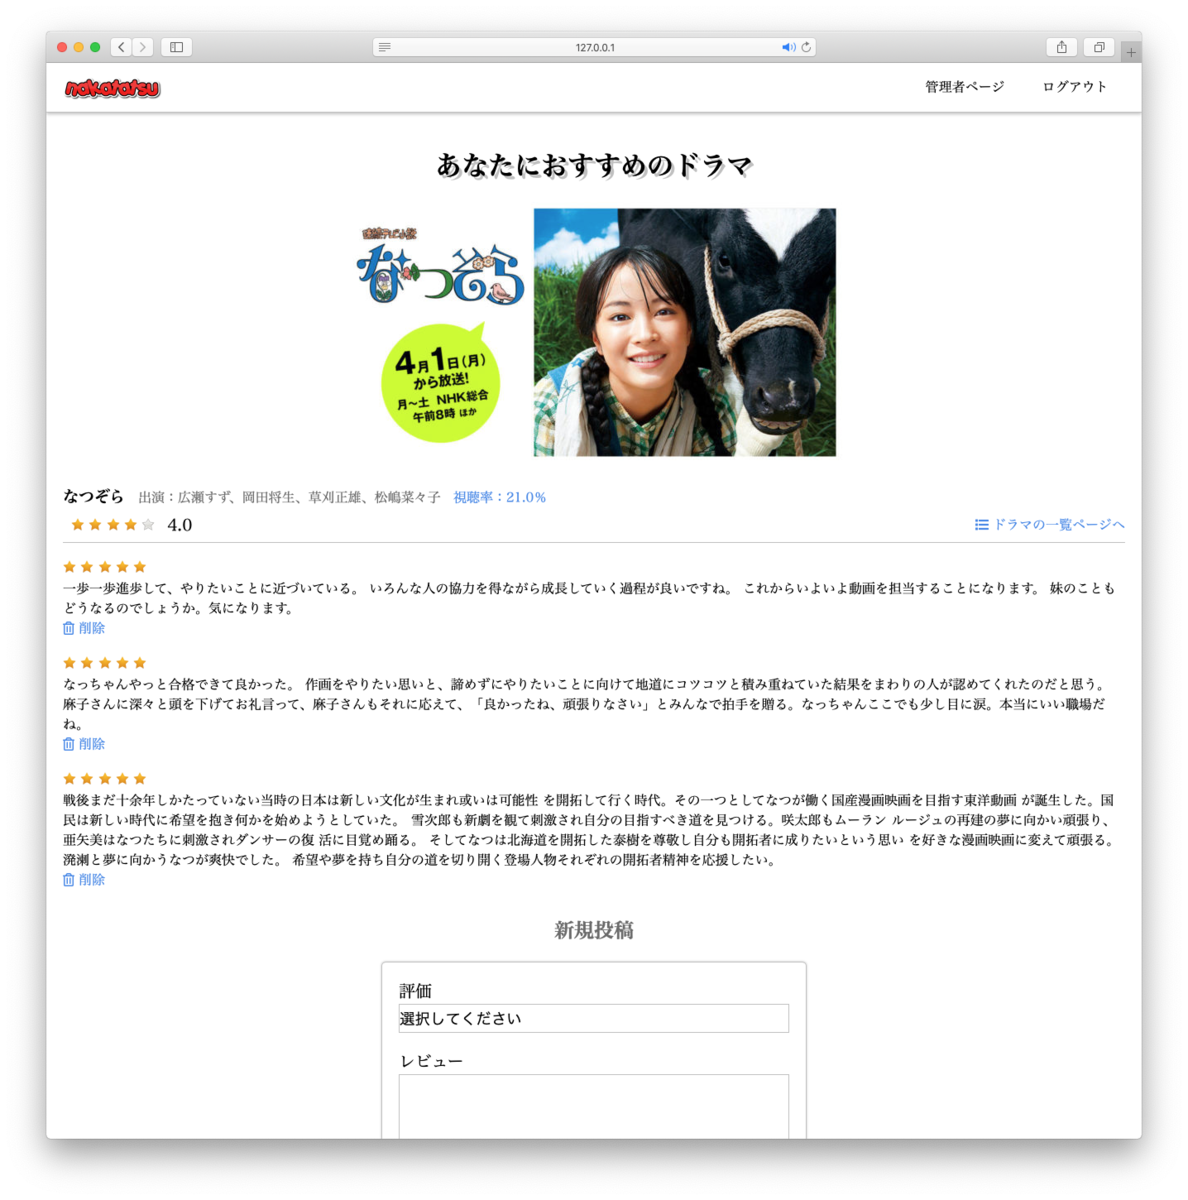 f:id:nakatatsu_com:20190614220639p:plain